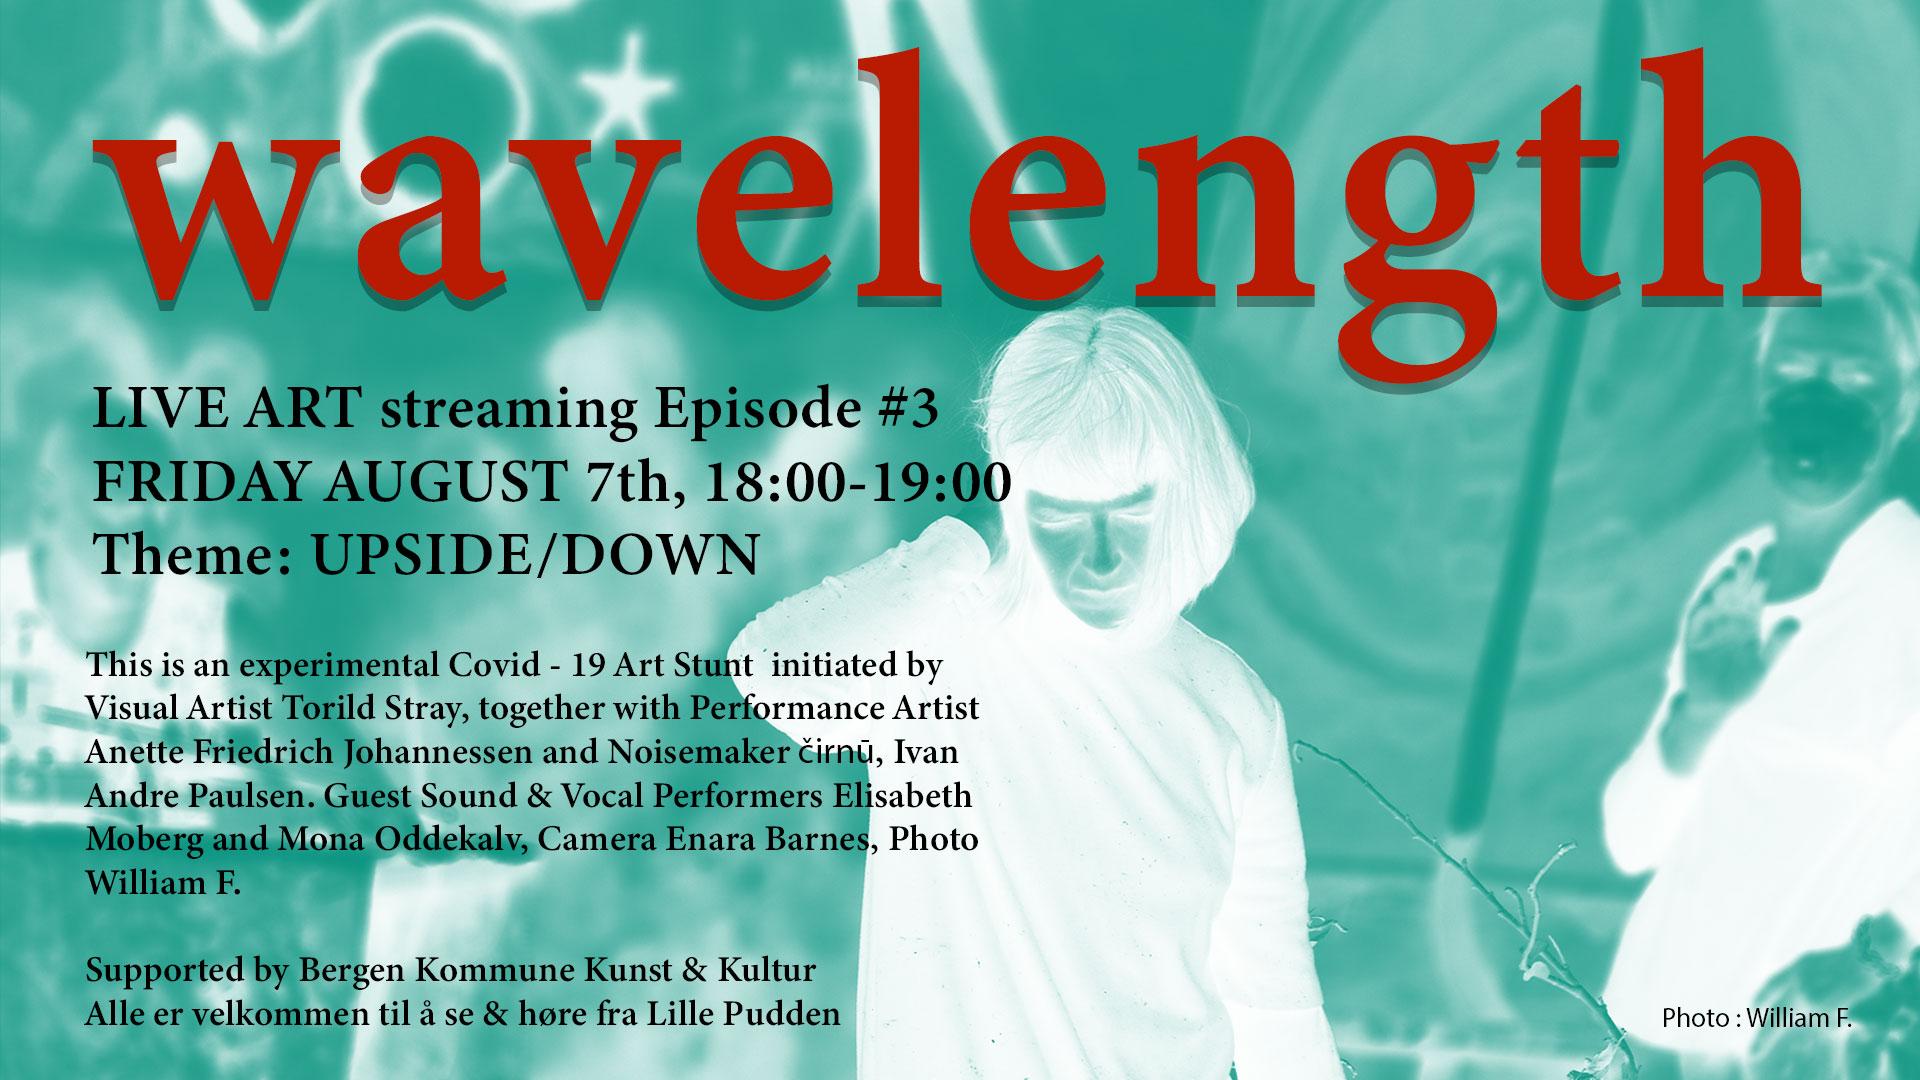 Wavelength – LIVE ART streaming Episode #3